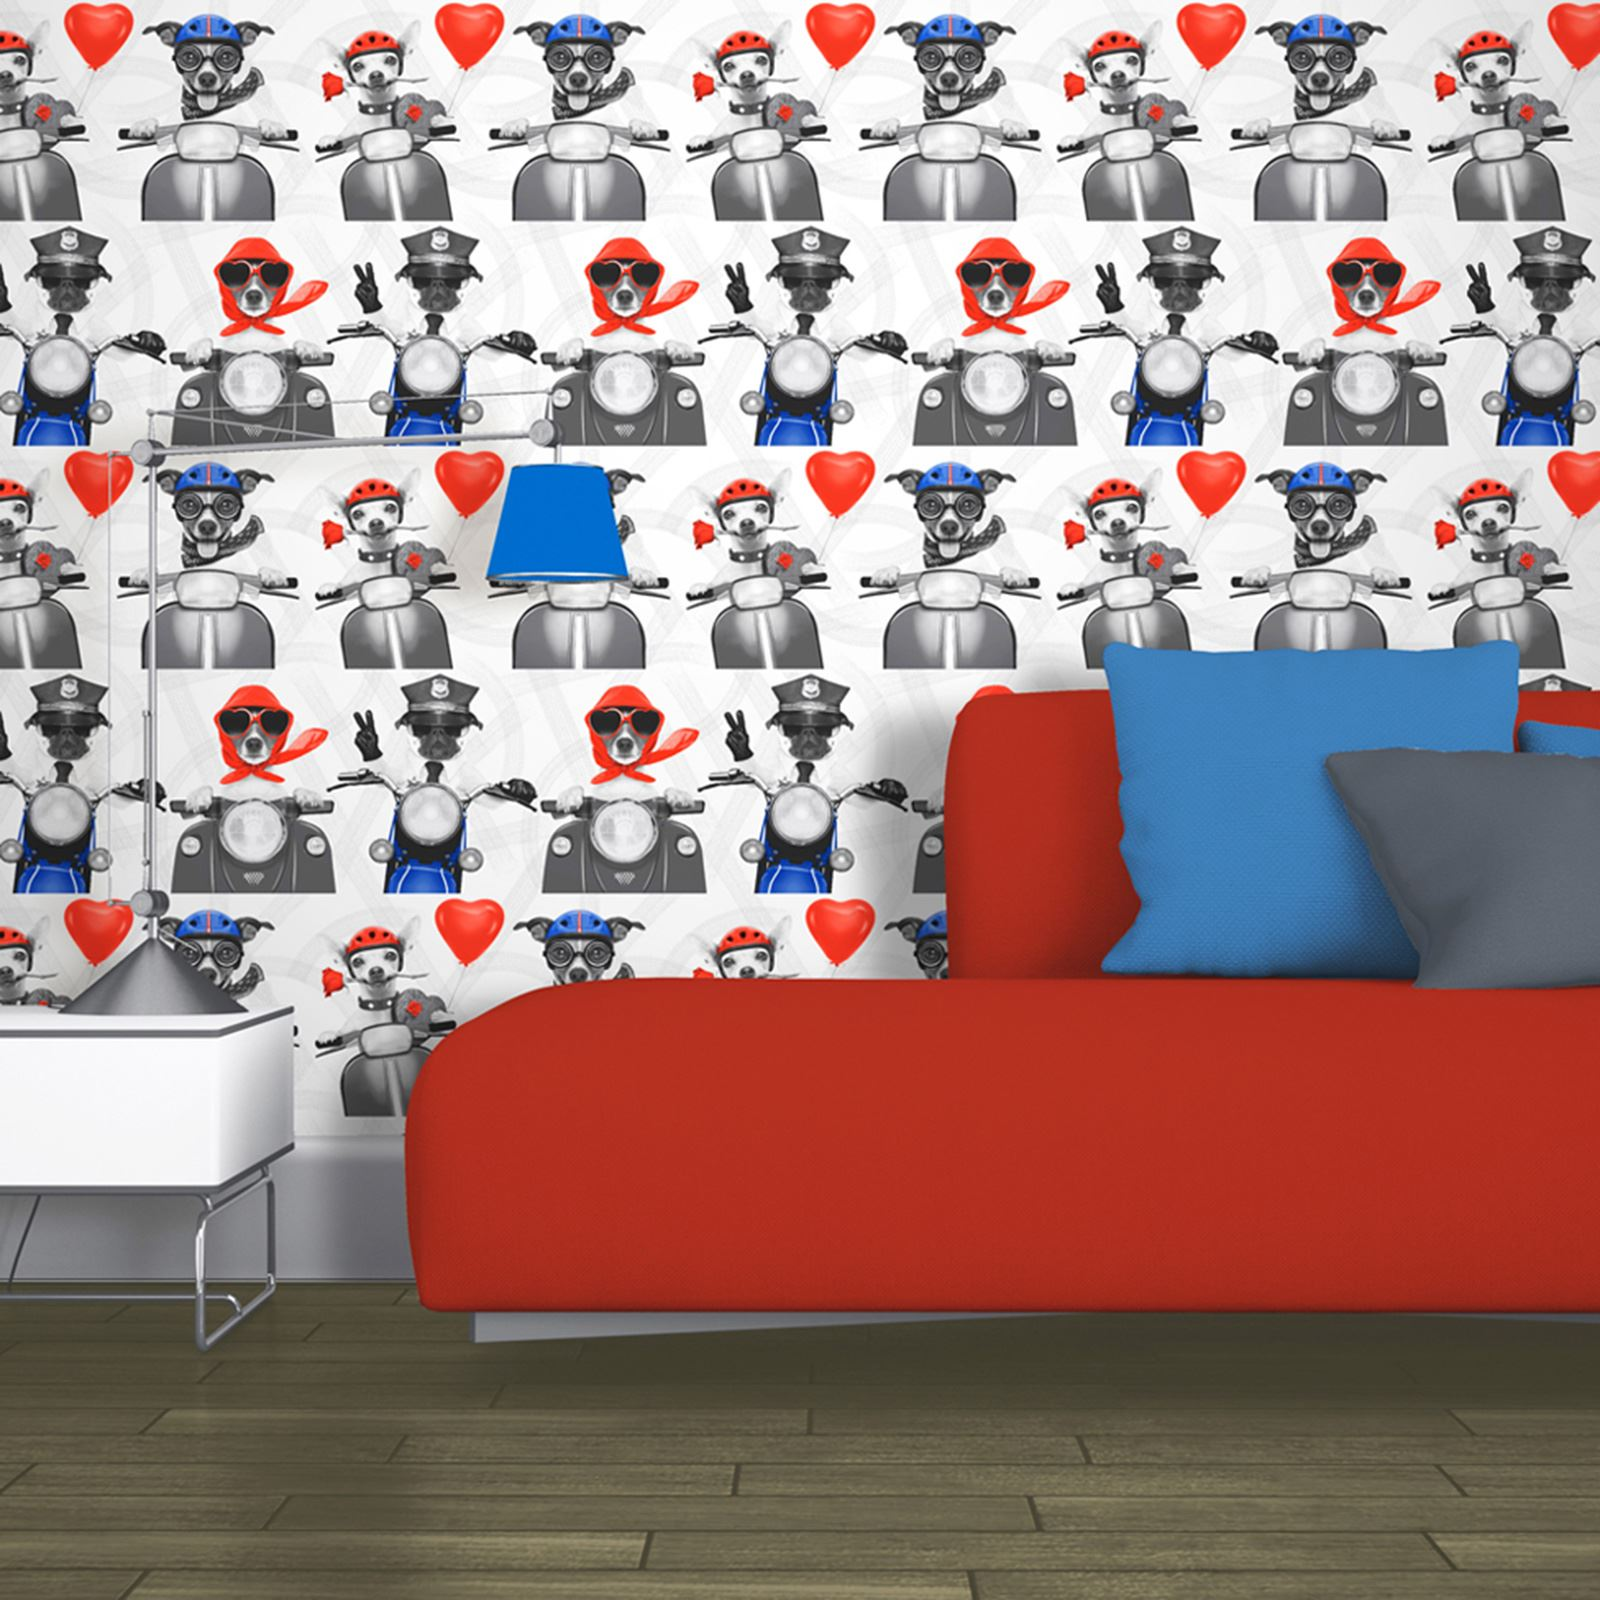 Biker Dogs Wallpaper Muriva 102561 New Scooters Pug Puppy Puppies